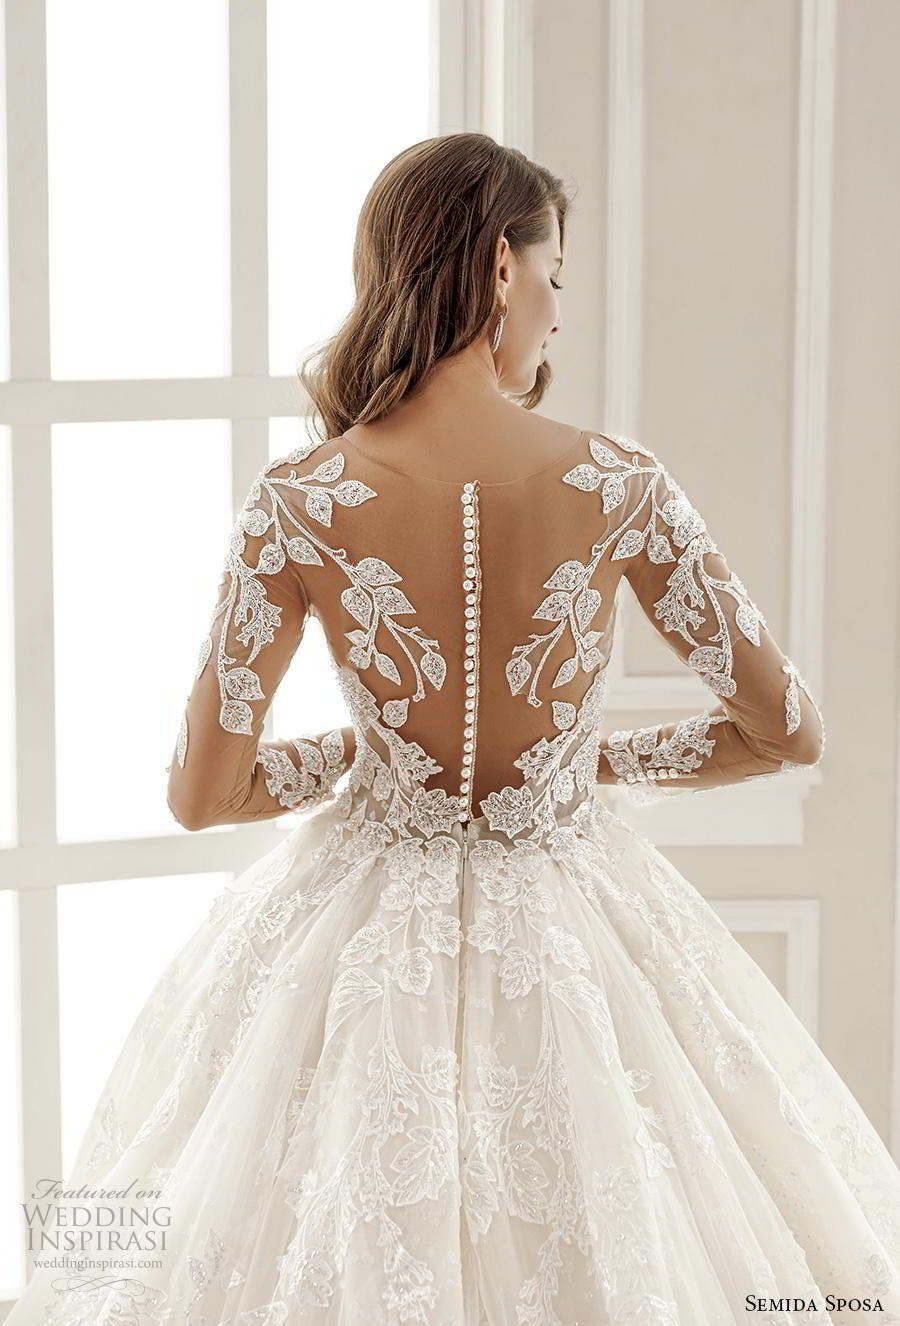 Semida Sposa 2020 Wedding Dresses Amazon Bridal Collection Wedding Inspirasi Wedding Dresses Lace Wedding Dress Necklines Wedding Dresses [ 1326 x 900 Pixel ]